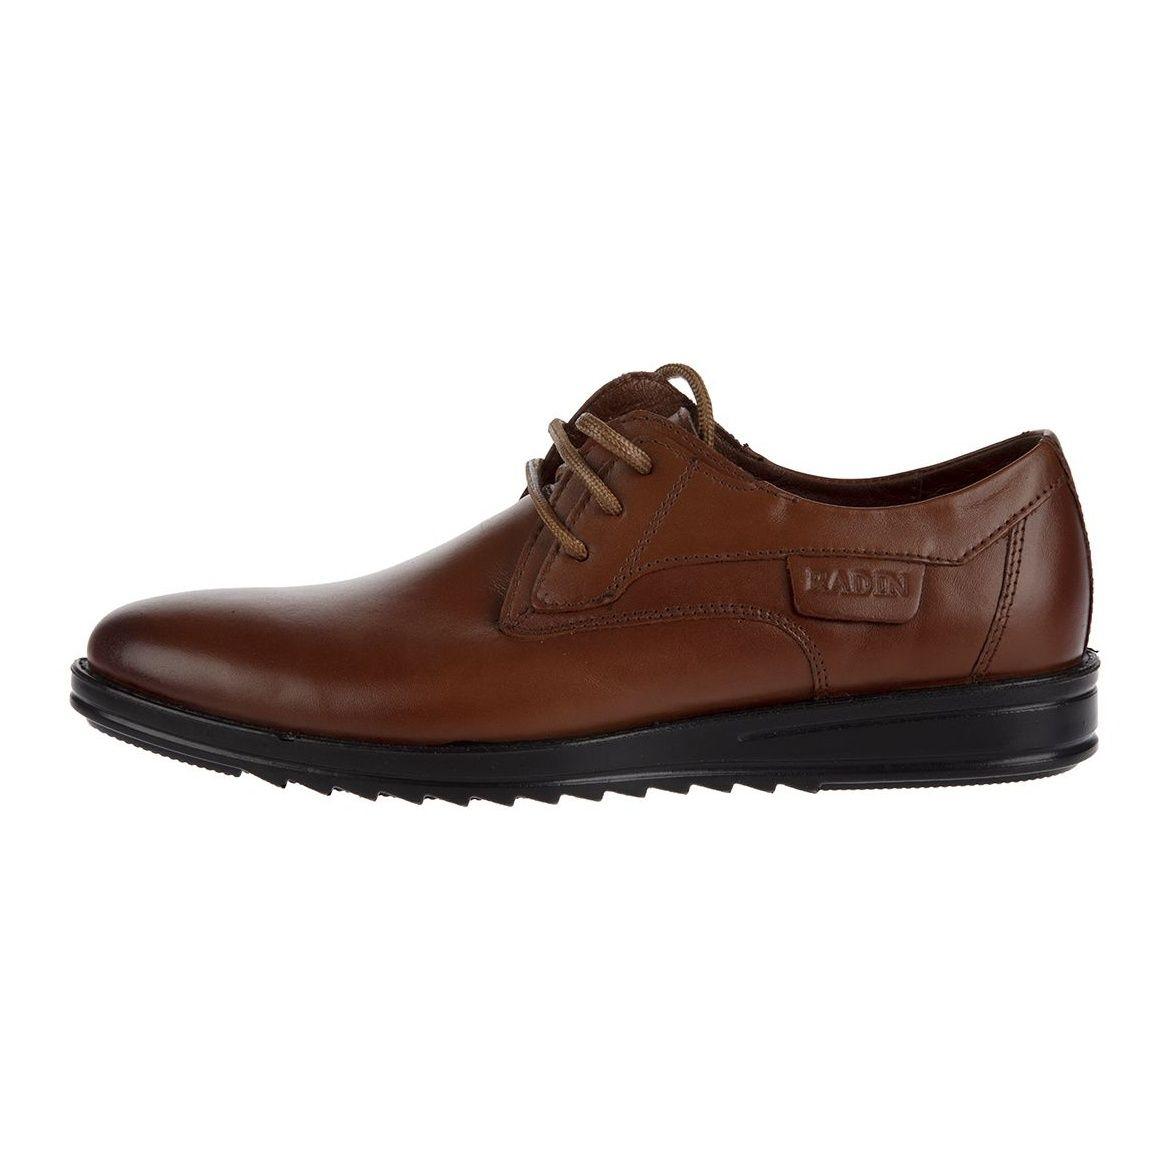 کفش روزمره مردانه رادین کد 1986-3 -  - 3